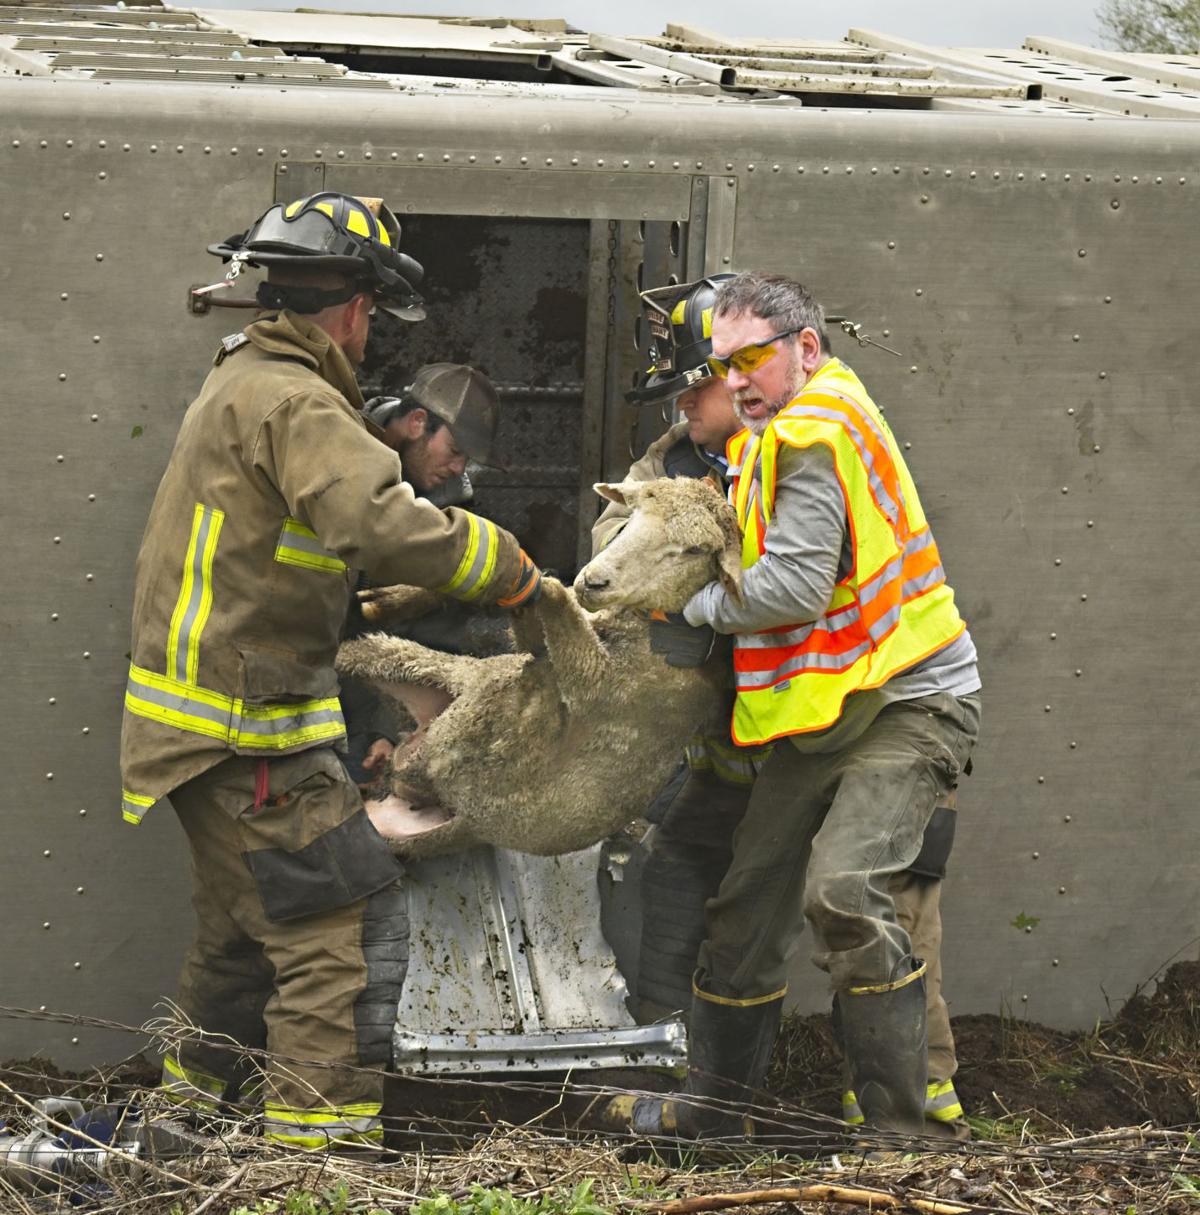 Sheep Truck wreck 4P.jpg